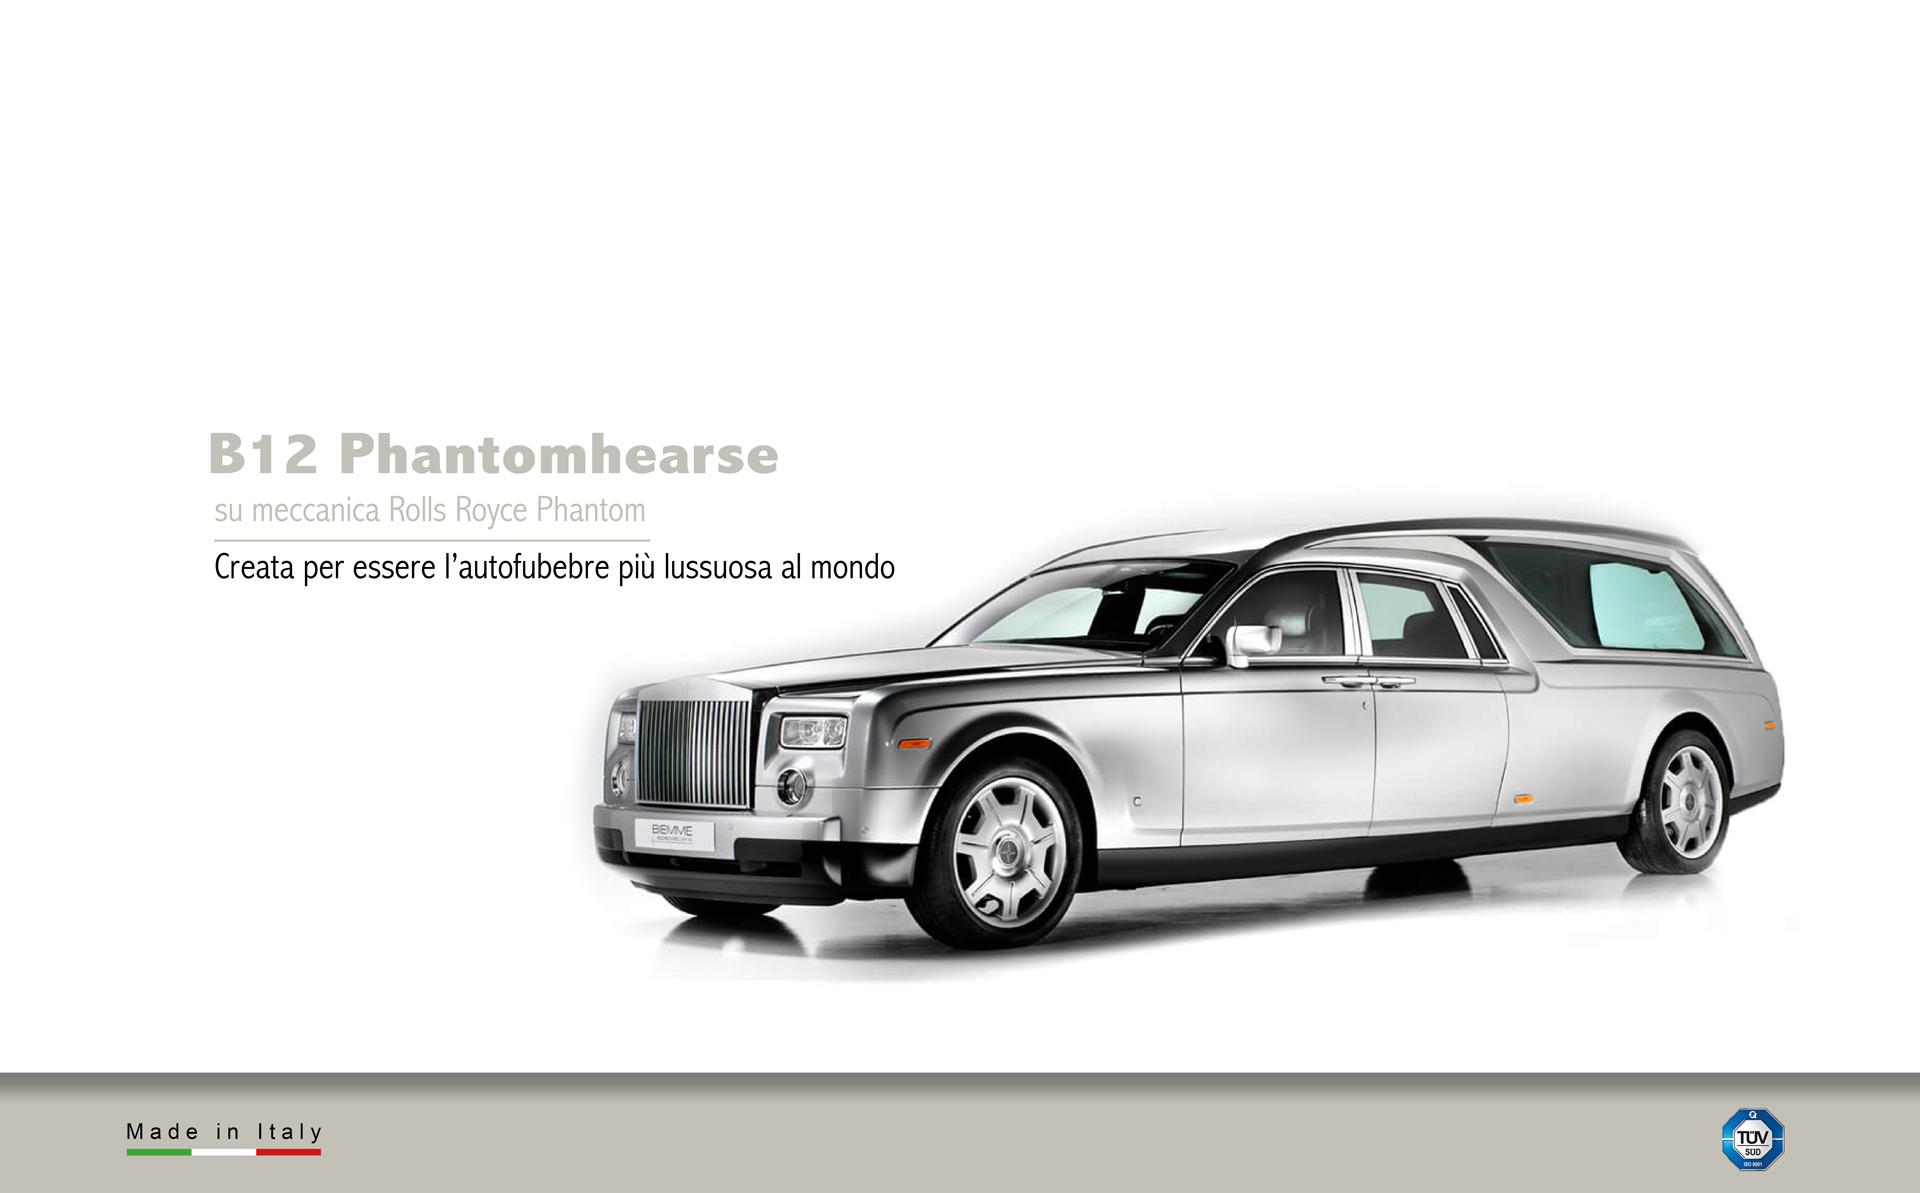 hearses dricuri corbillards mechanical Rolls Royce